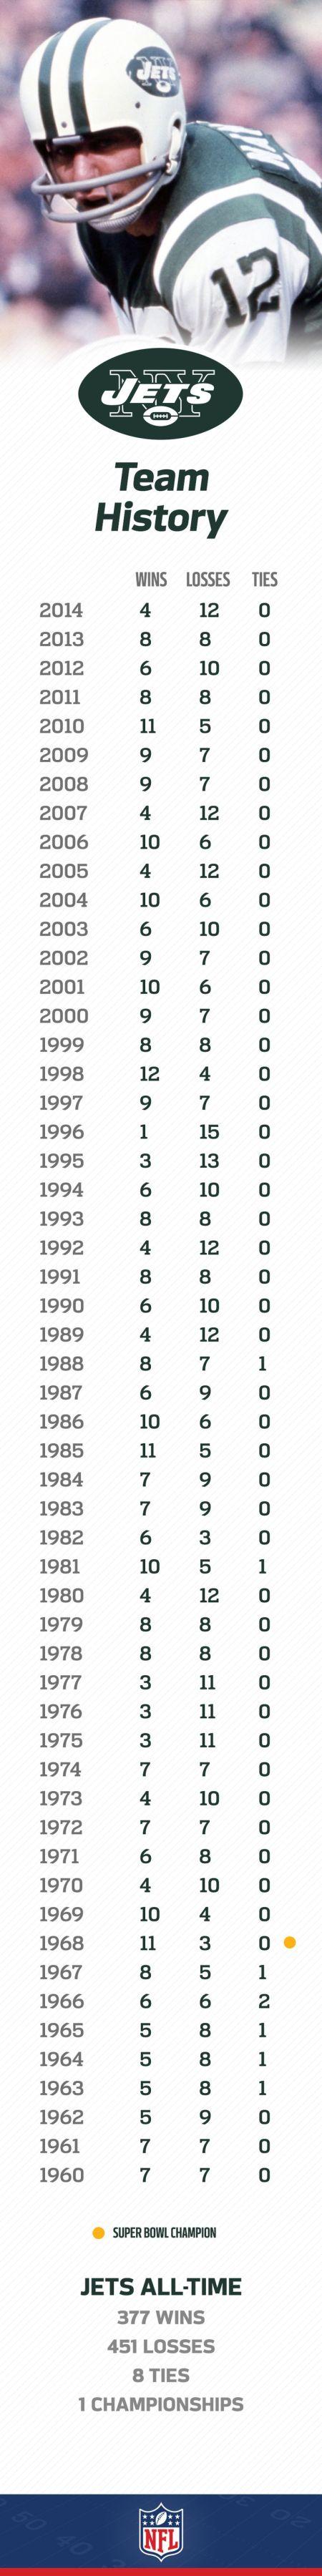 Year Jets Won Super Bowl